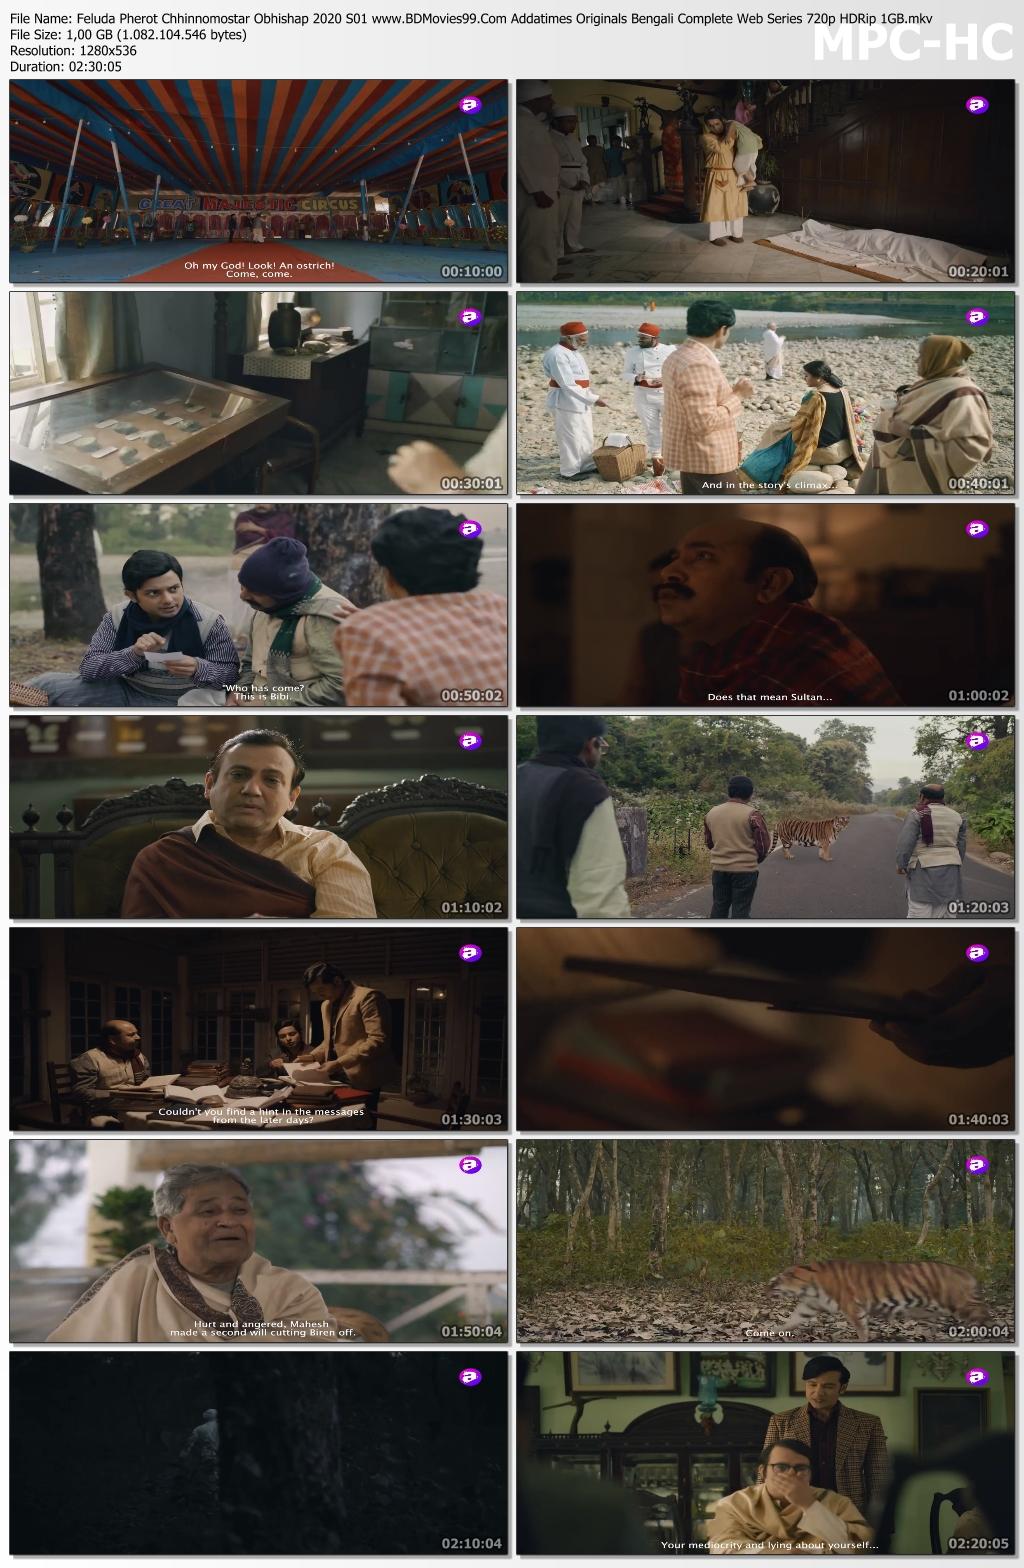 Feluda-Pherot-Chhinnomostar-Obhishap-2020-S01-www-BDMovies99-Com-Addatimes-Originals-Bengali-Complet